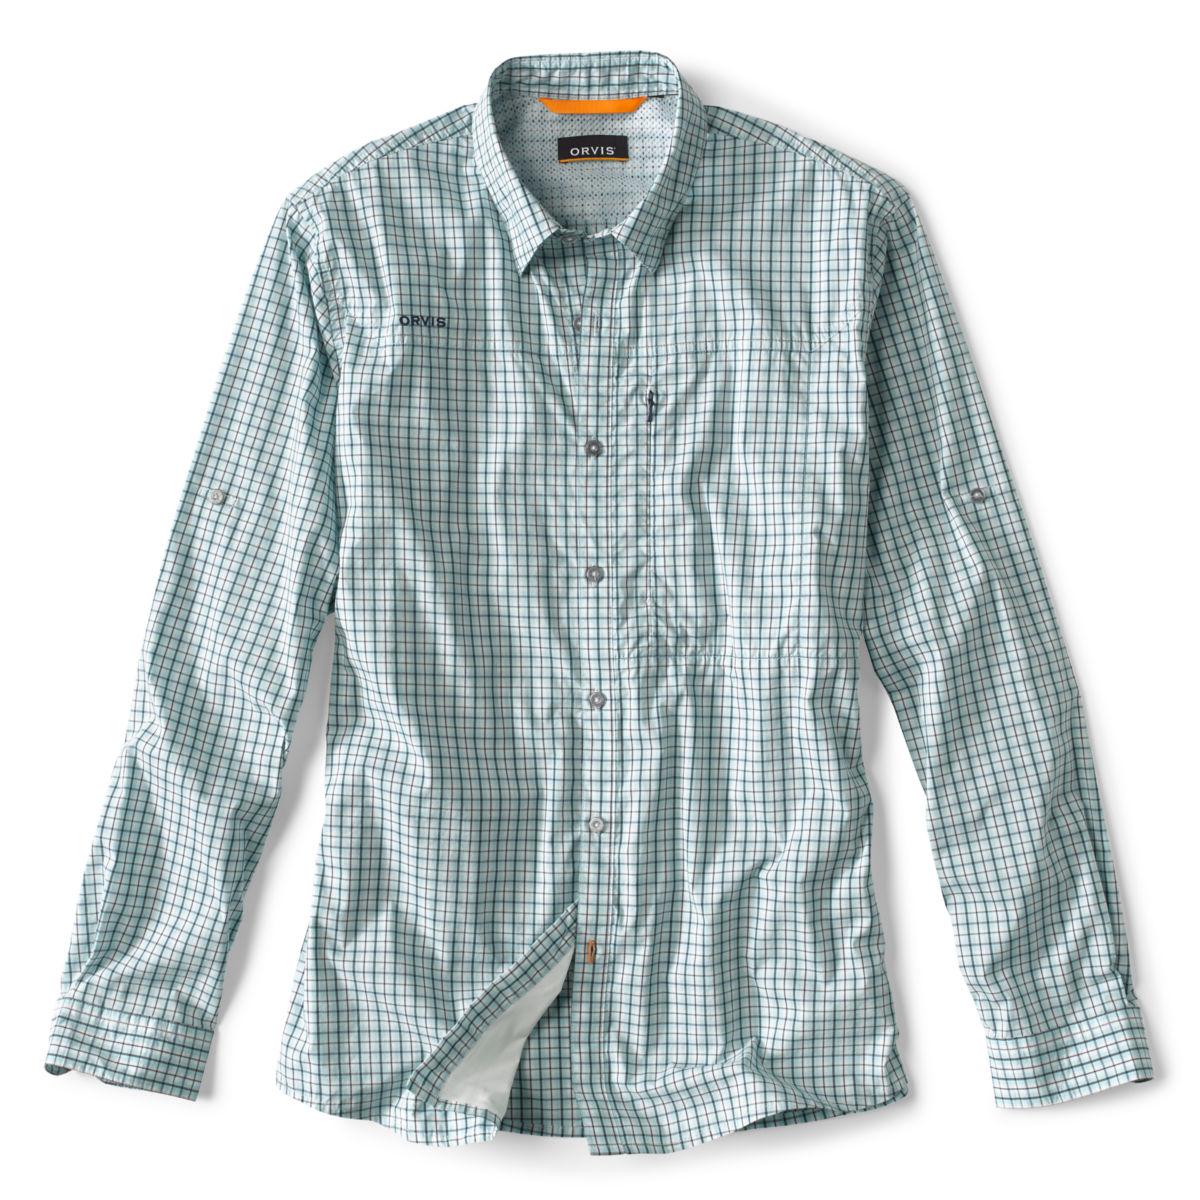 South Fork Long-Sleeved Stretch Shirt - image number 0